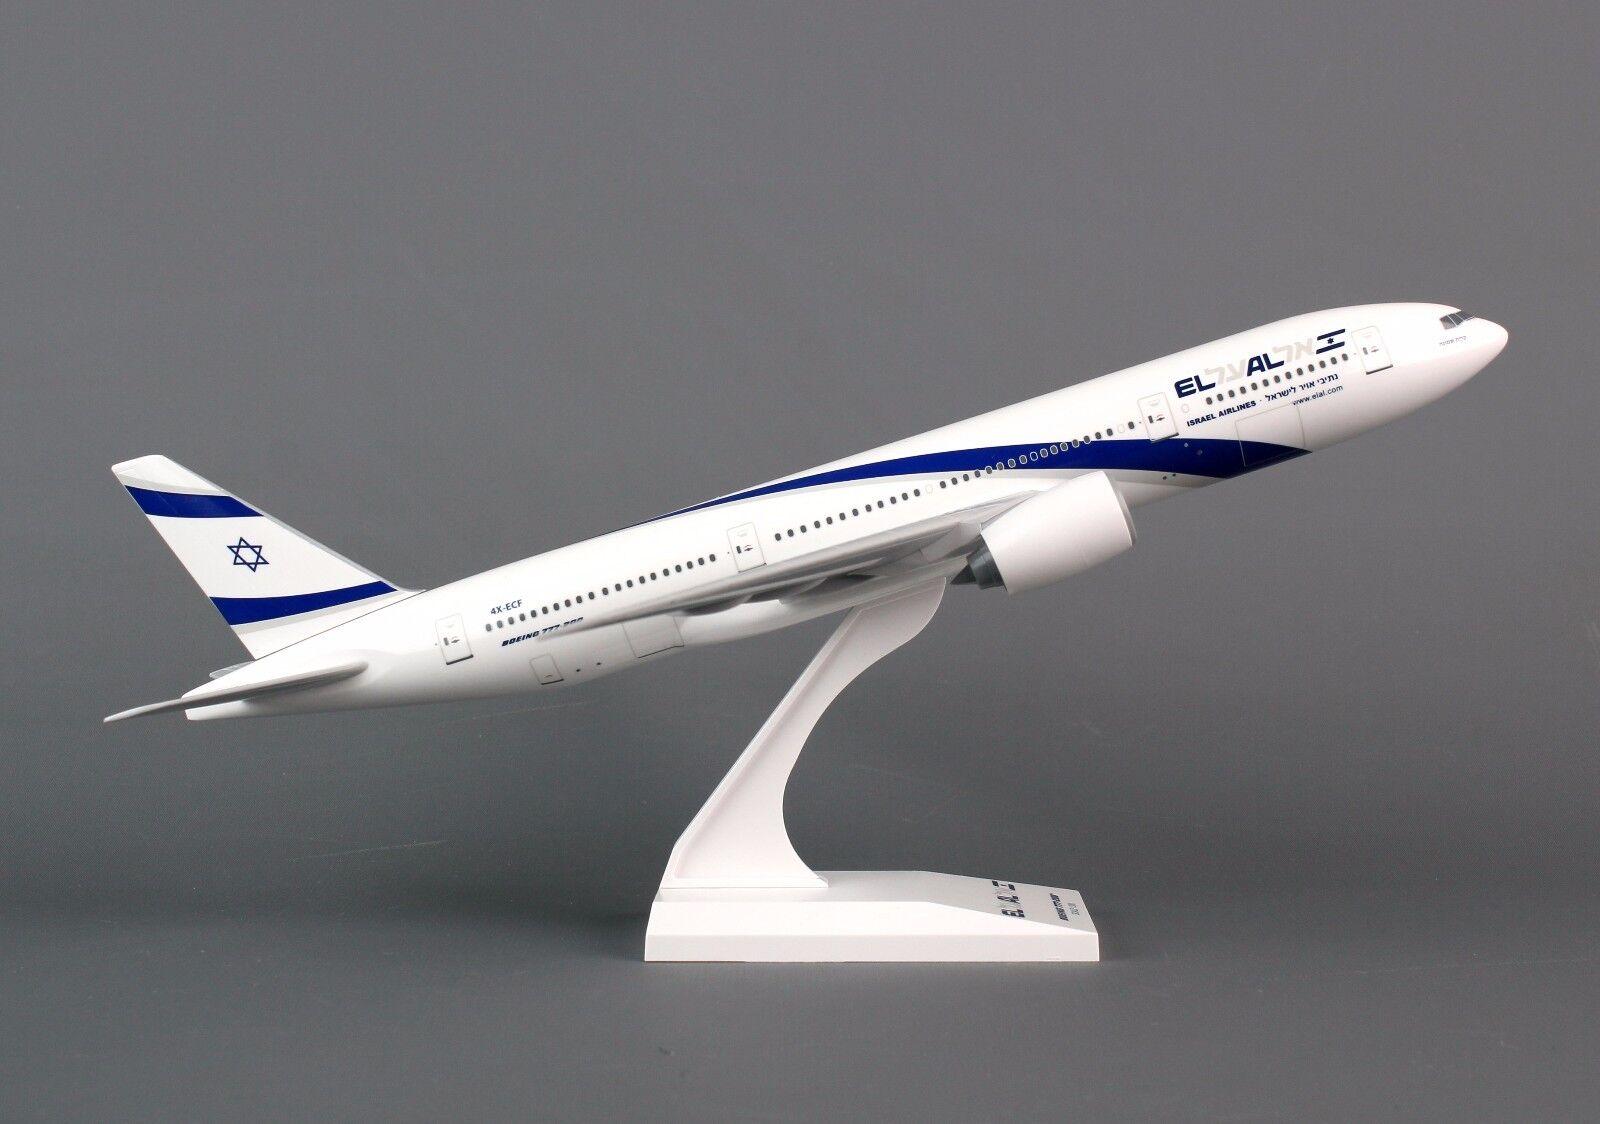 SkyMarks El Al Boeing 777-200 1 200 SKR745 RegX-ECF. New New New 641c14